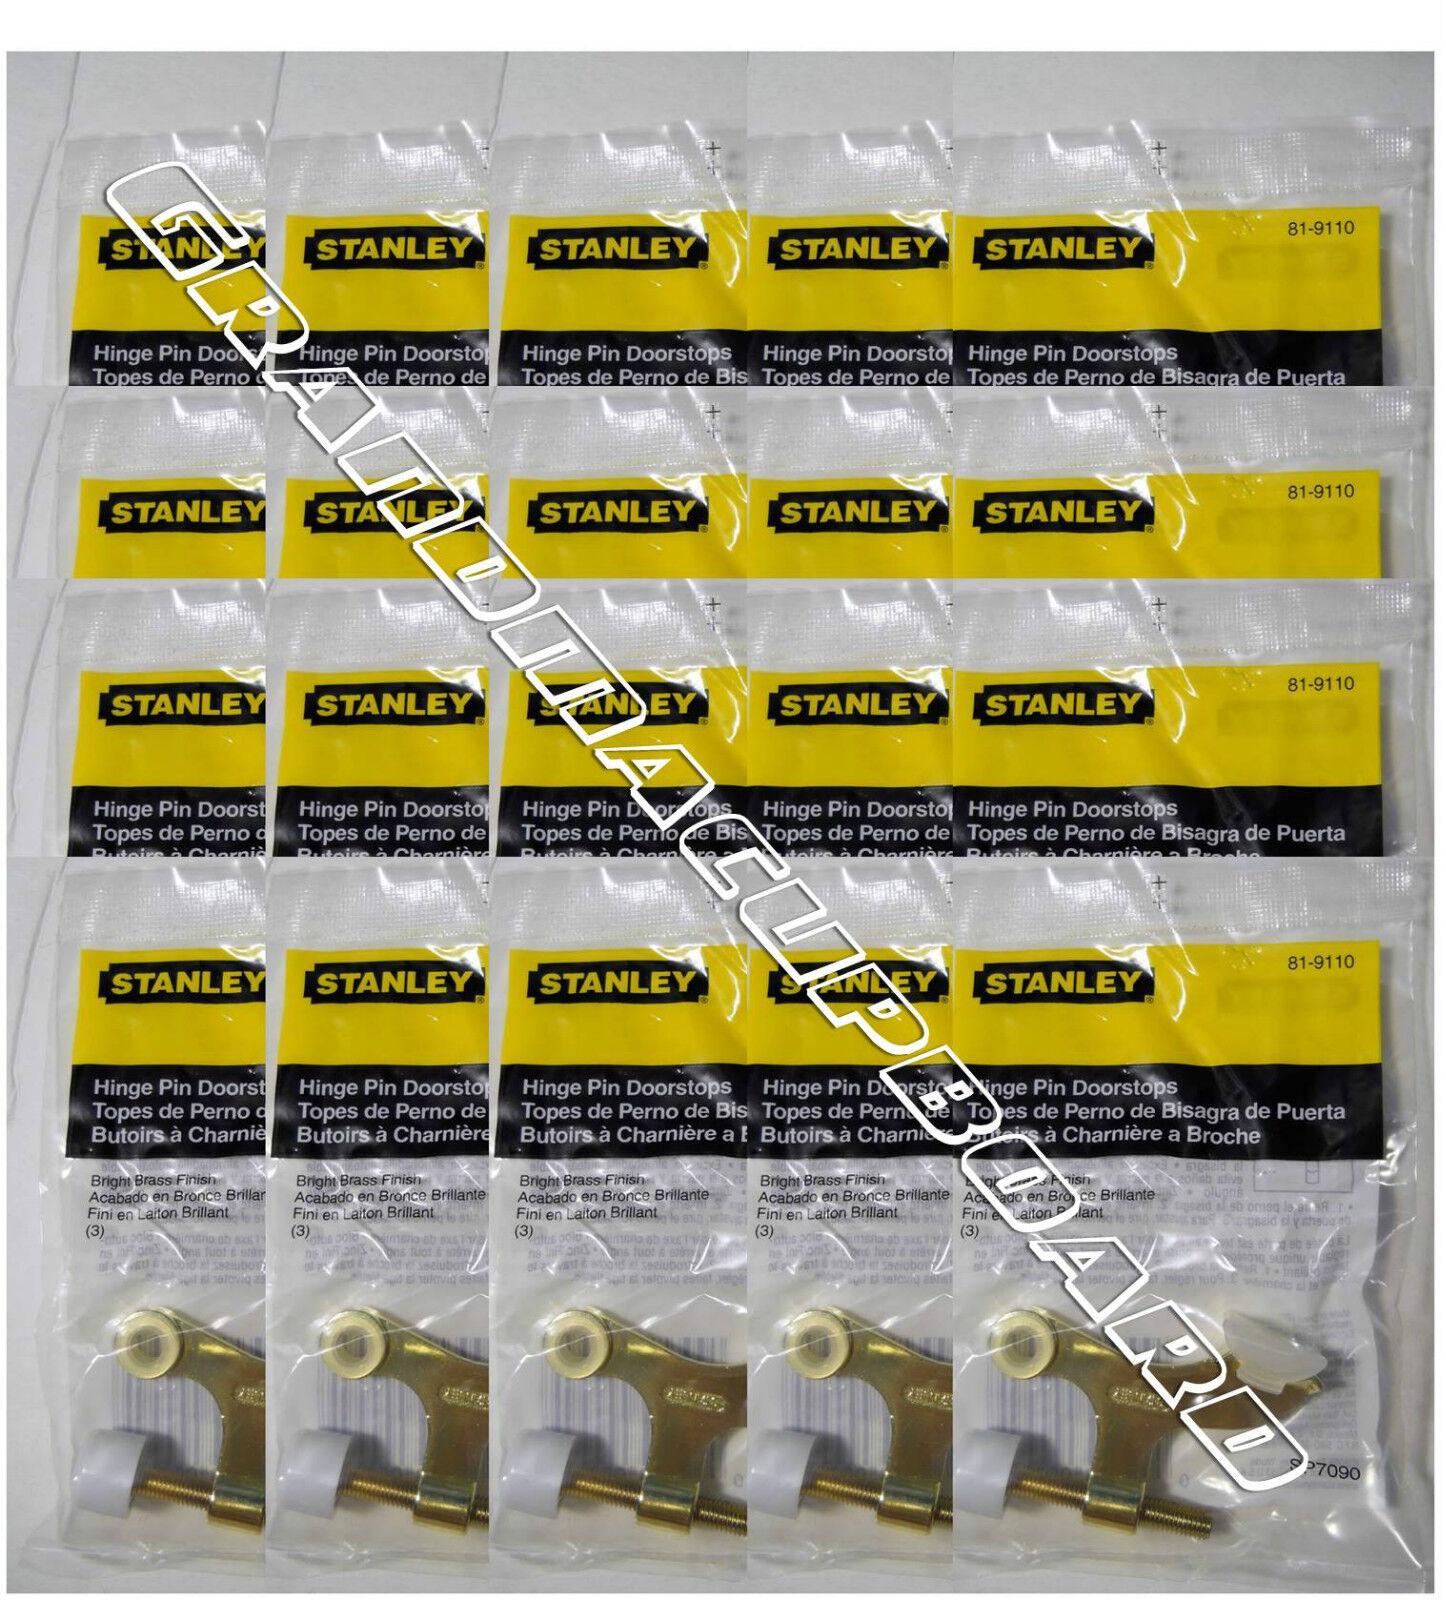 STANLEY HARDWARE Lot 5 Adjustable Brass Finish Hinge Pin Doorstop Model 81-9110